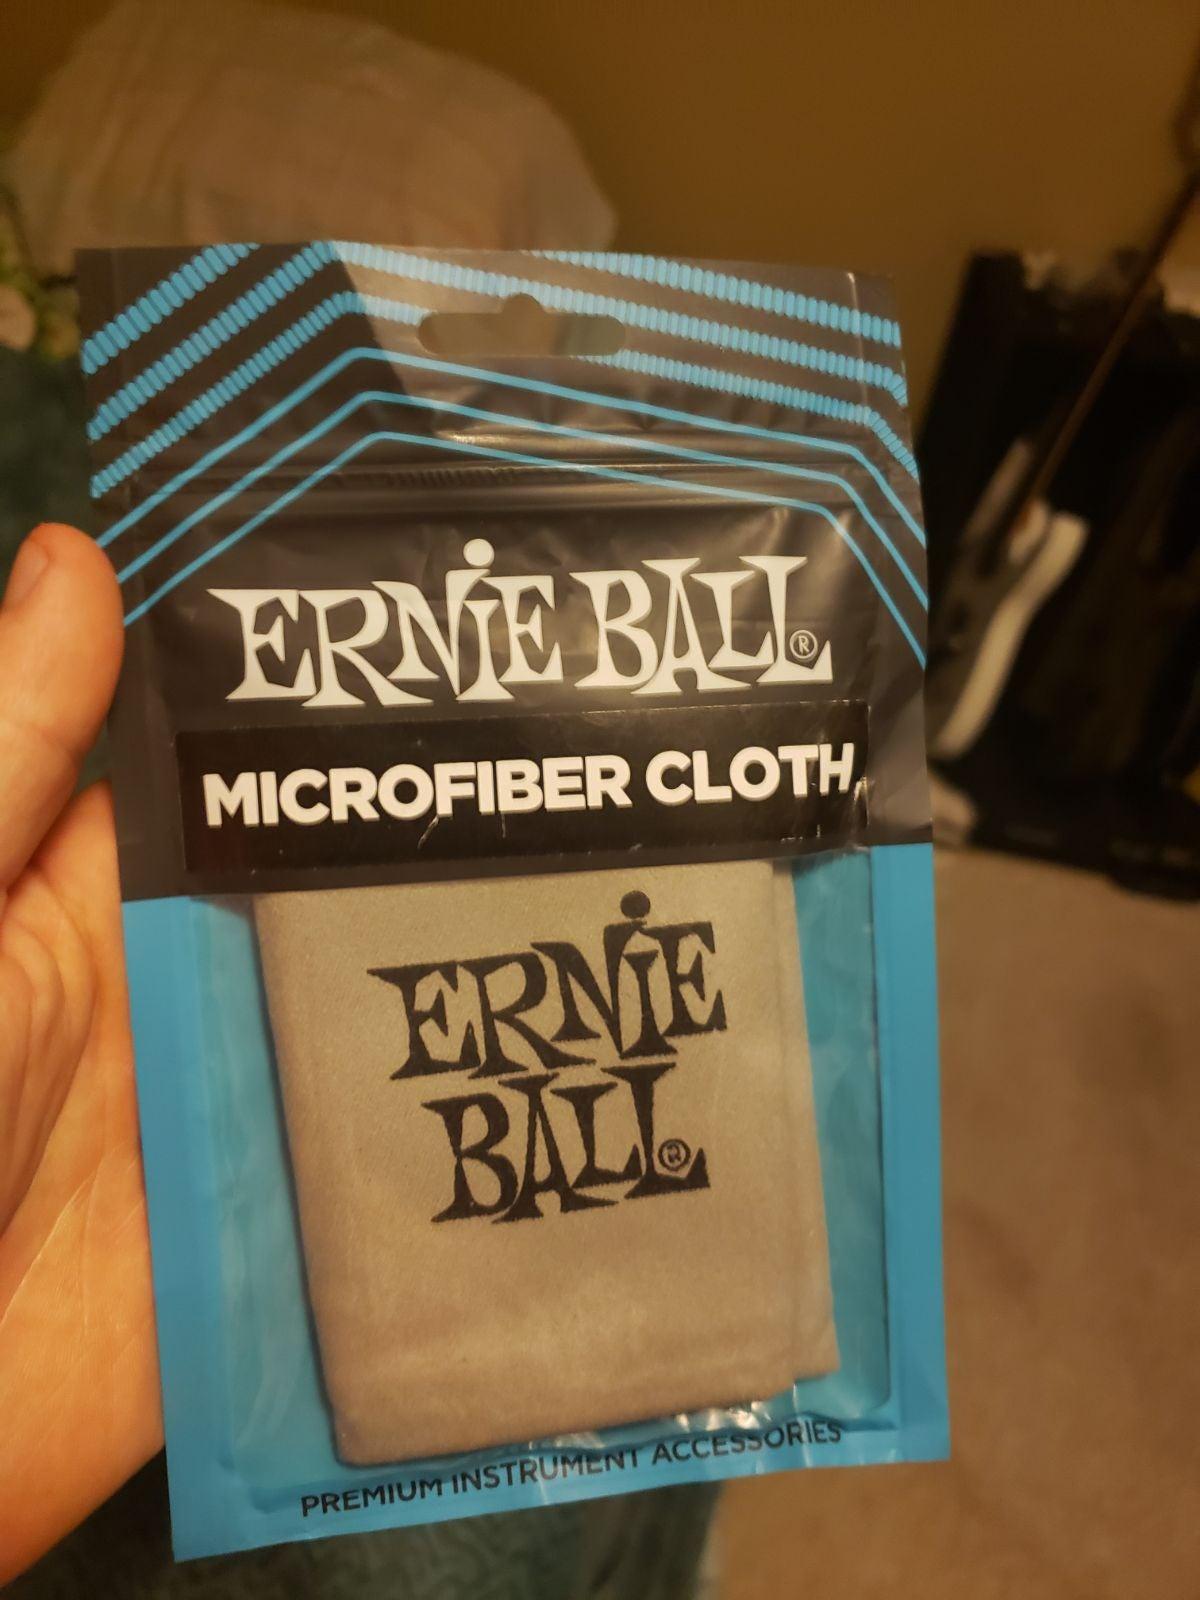 Brand new Ernie Ball Microfiber cloth